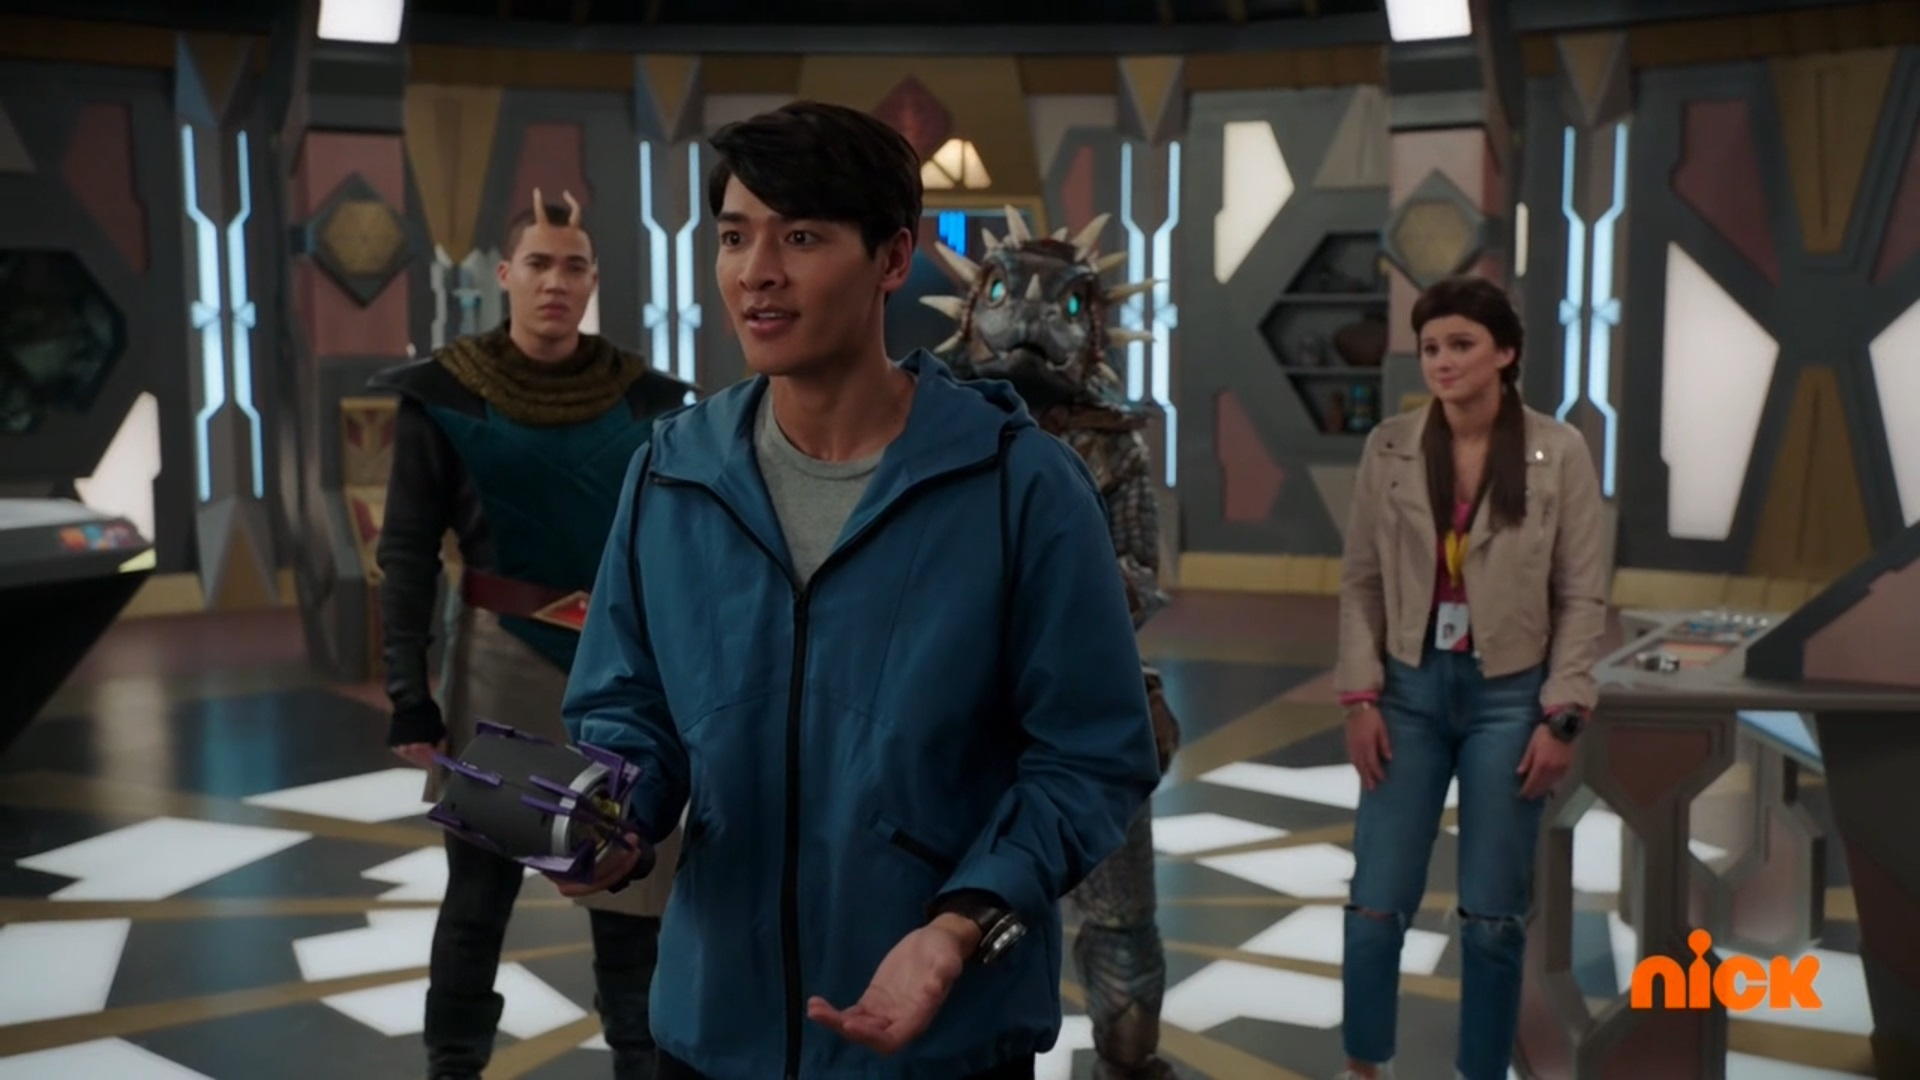 Power Rangers Dino Fury Episode 2 recap